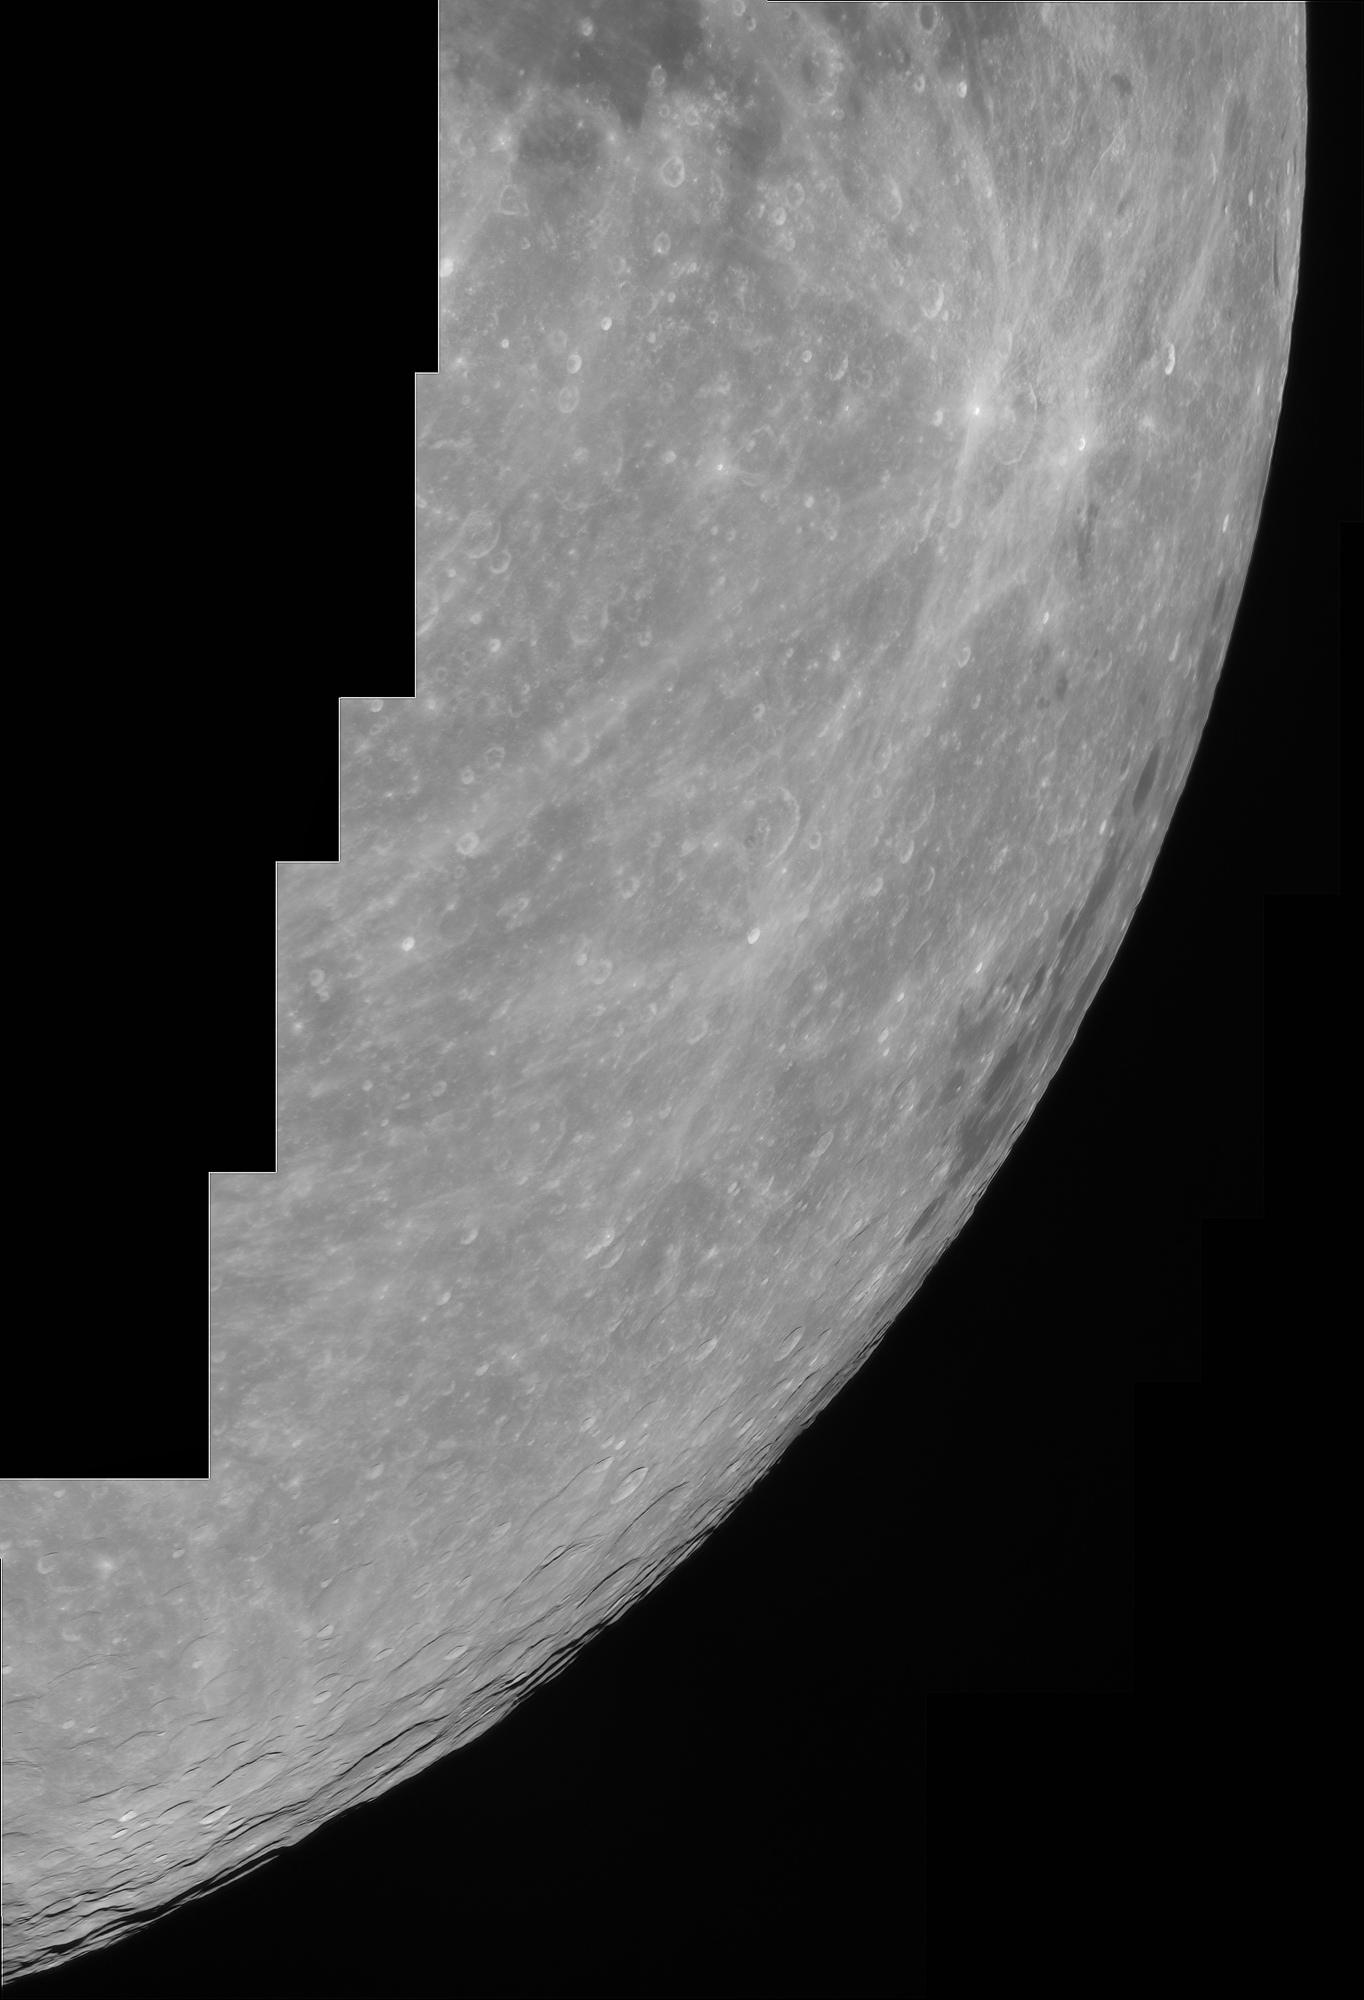 2021-02-26-2123_1-Moon_AS_P25_lapl6_ap1350_stitch.thumb.jpg.7e5a998874e10da2d76c5a6957f74411.jpg